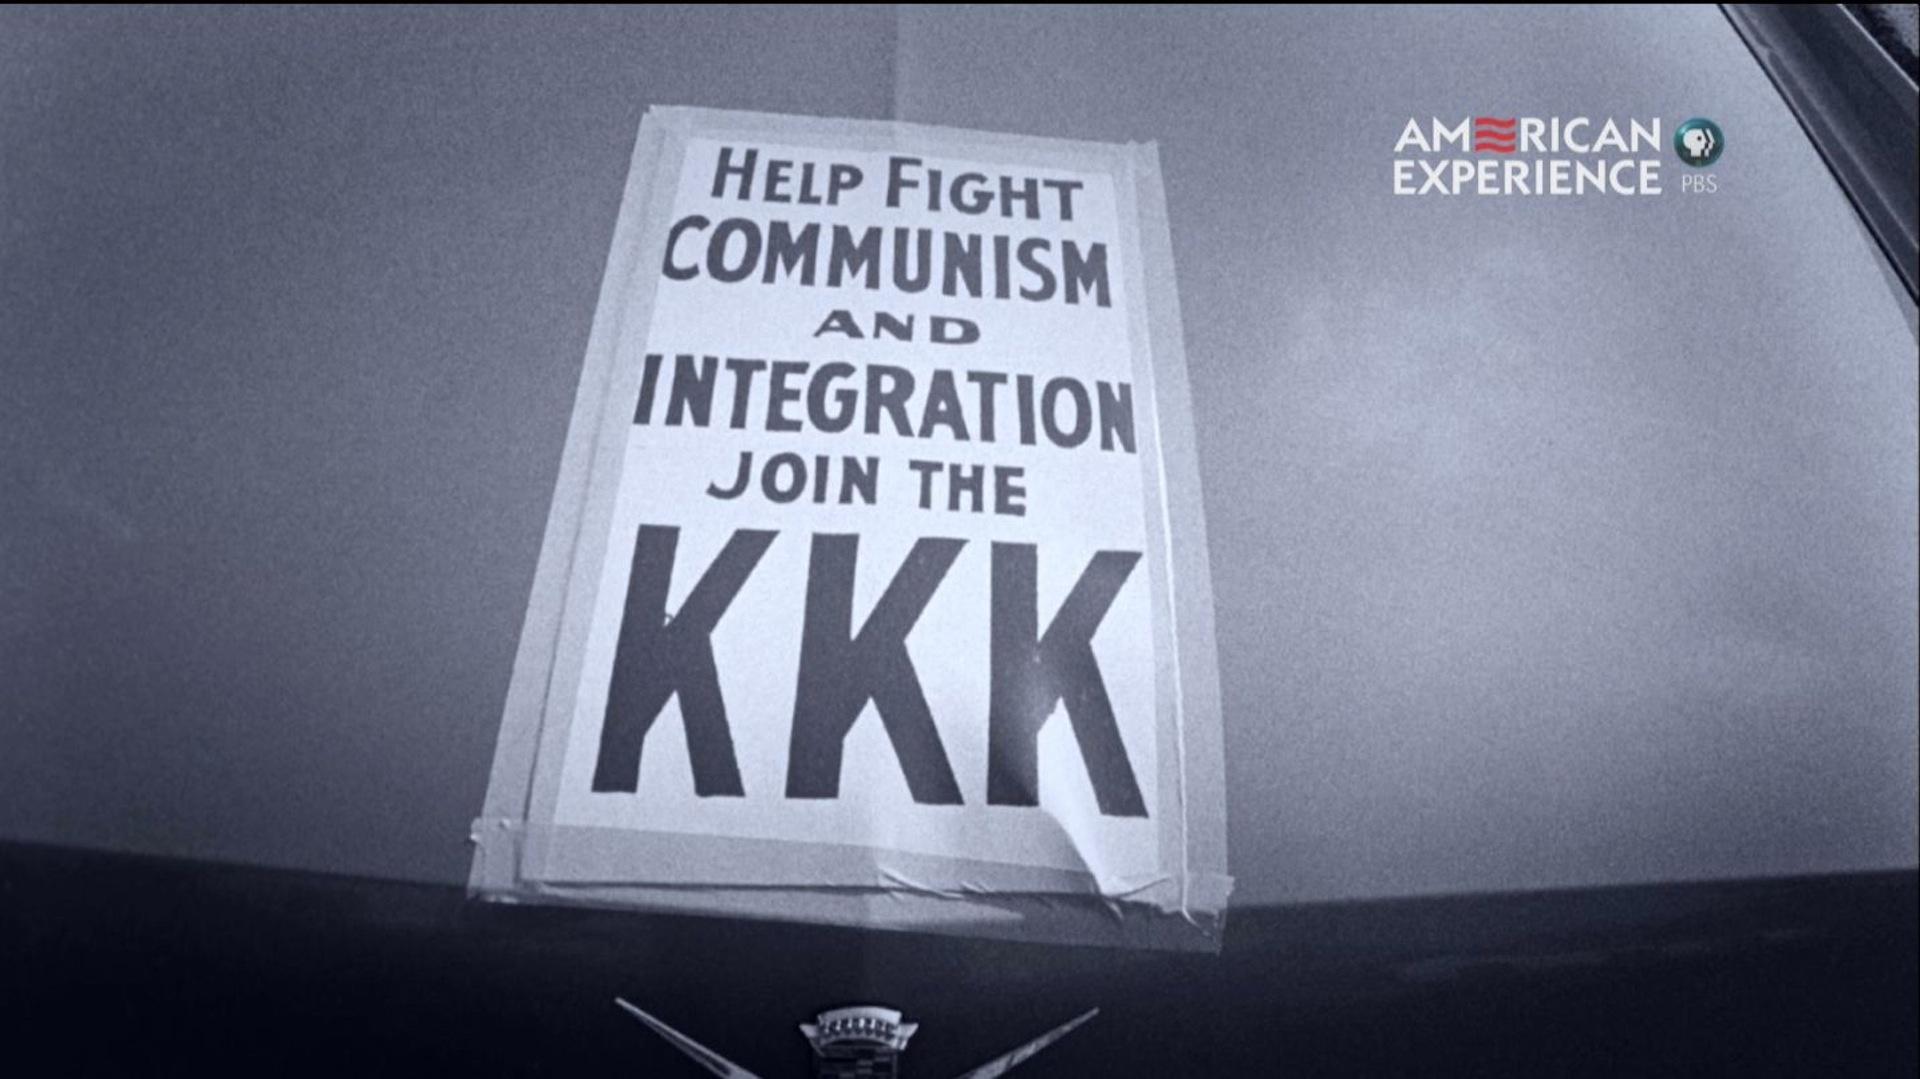 The FBI and the Klan